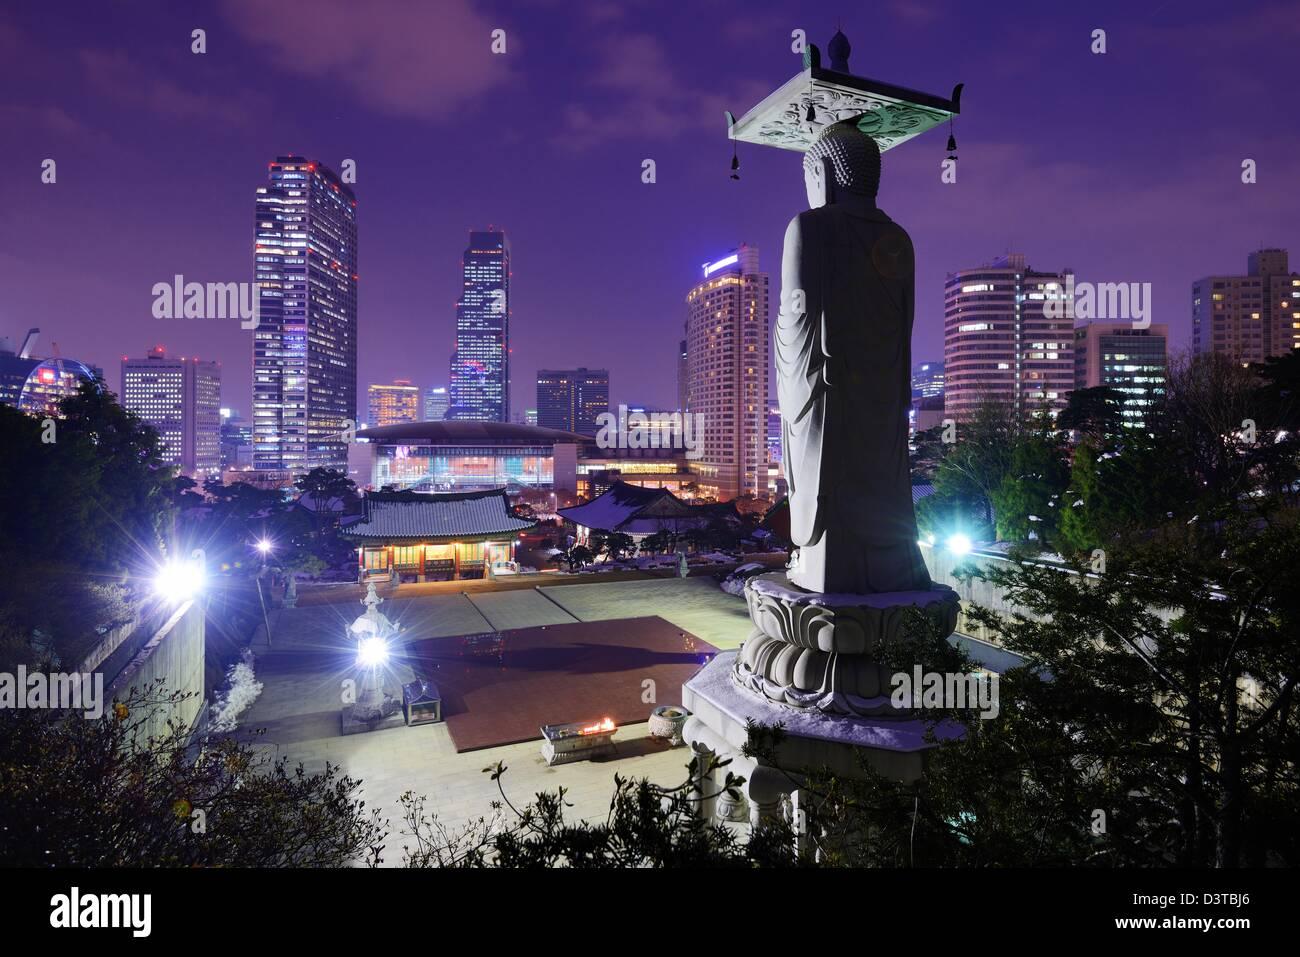 Bongeunsa Temple in the Gangnam District of Seoul, Korea. - Stock Image